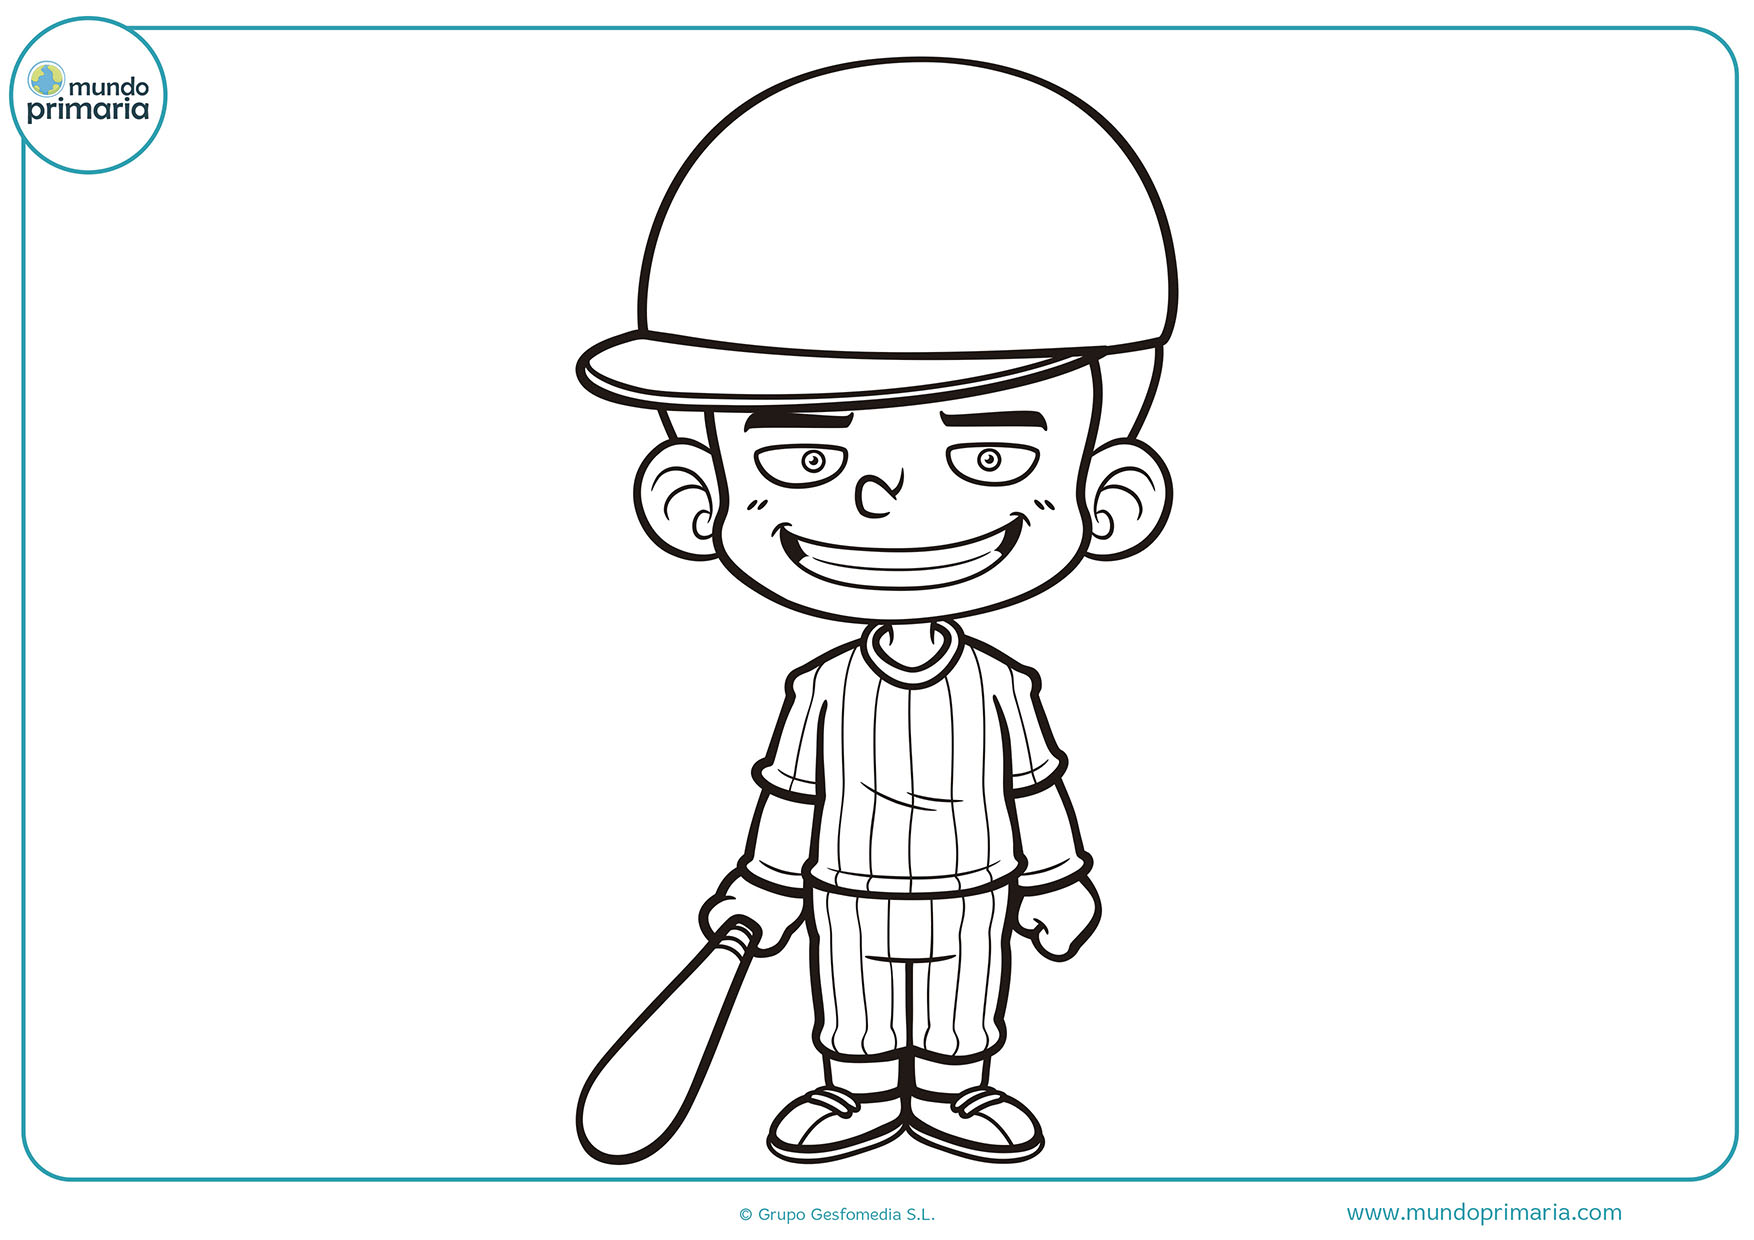 Dibujo beisbol para colorear e imprimir